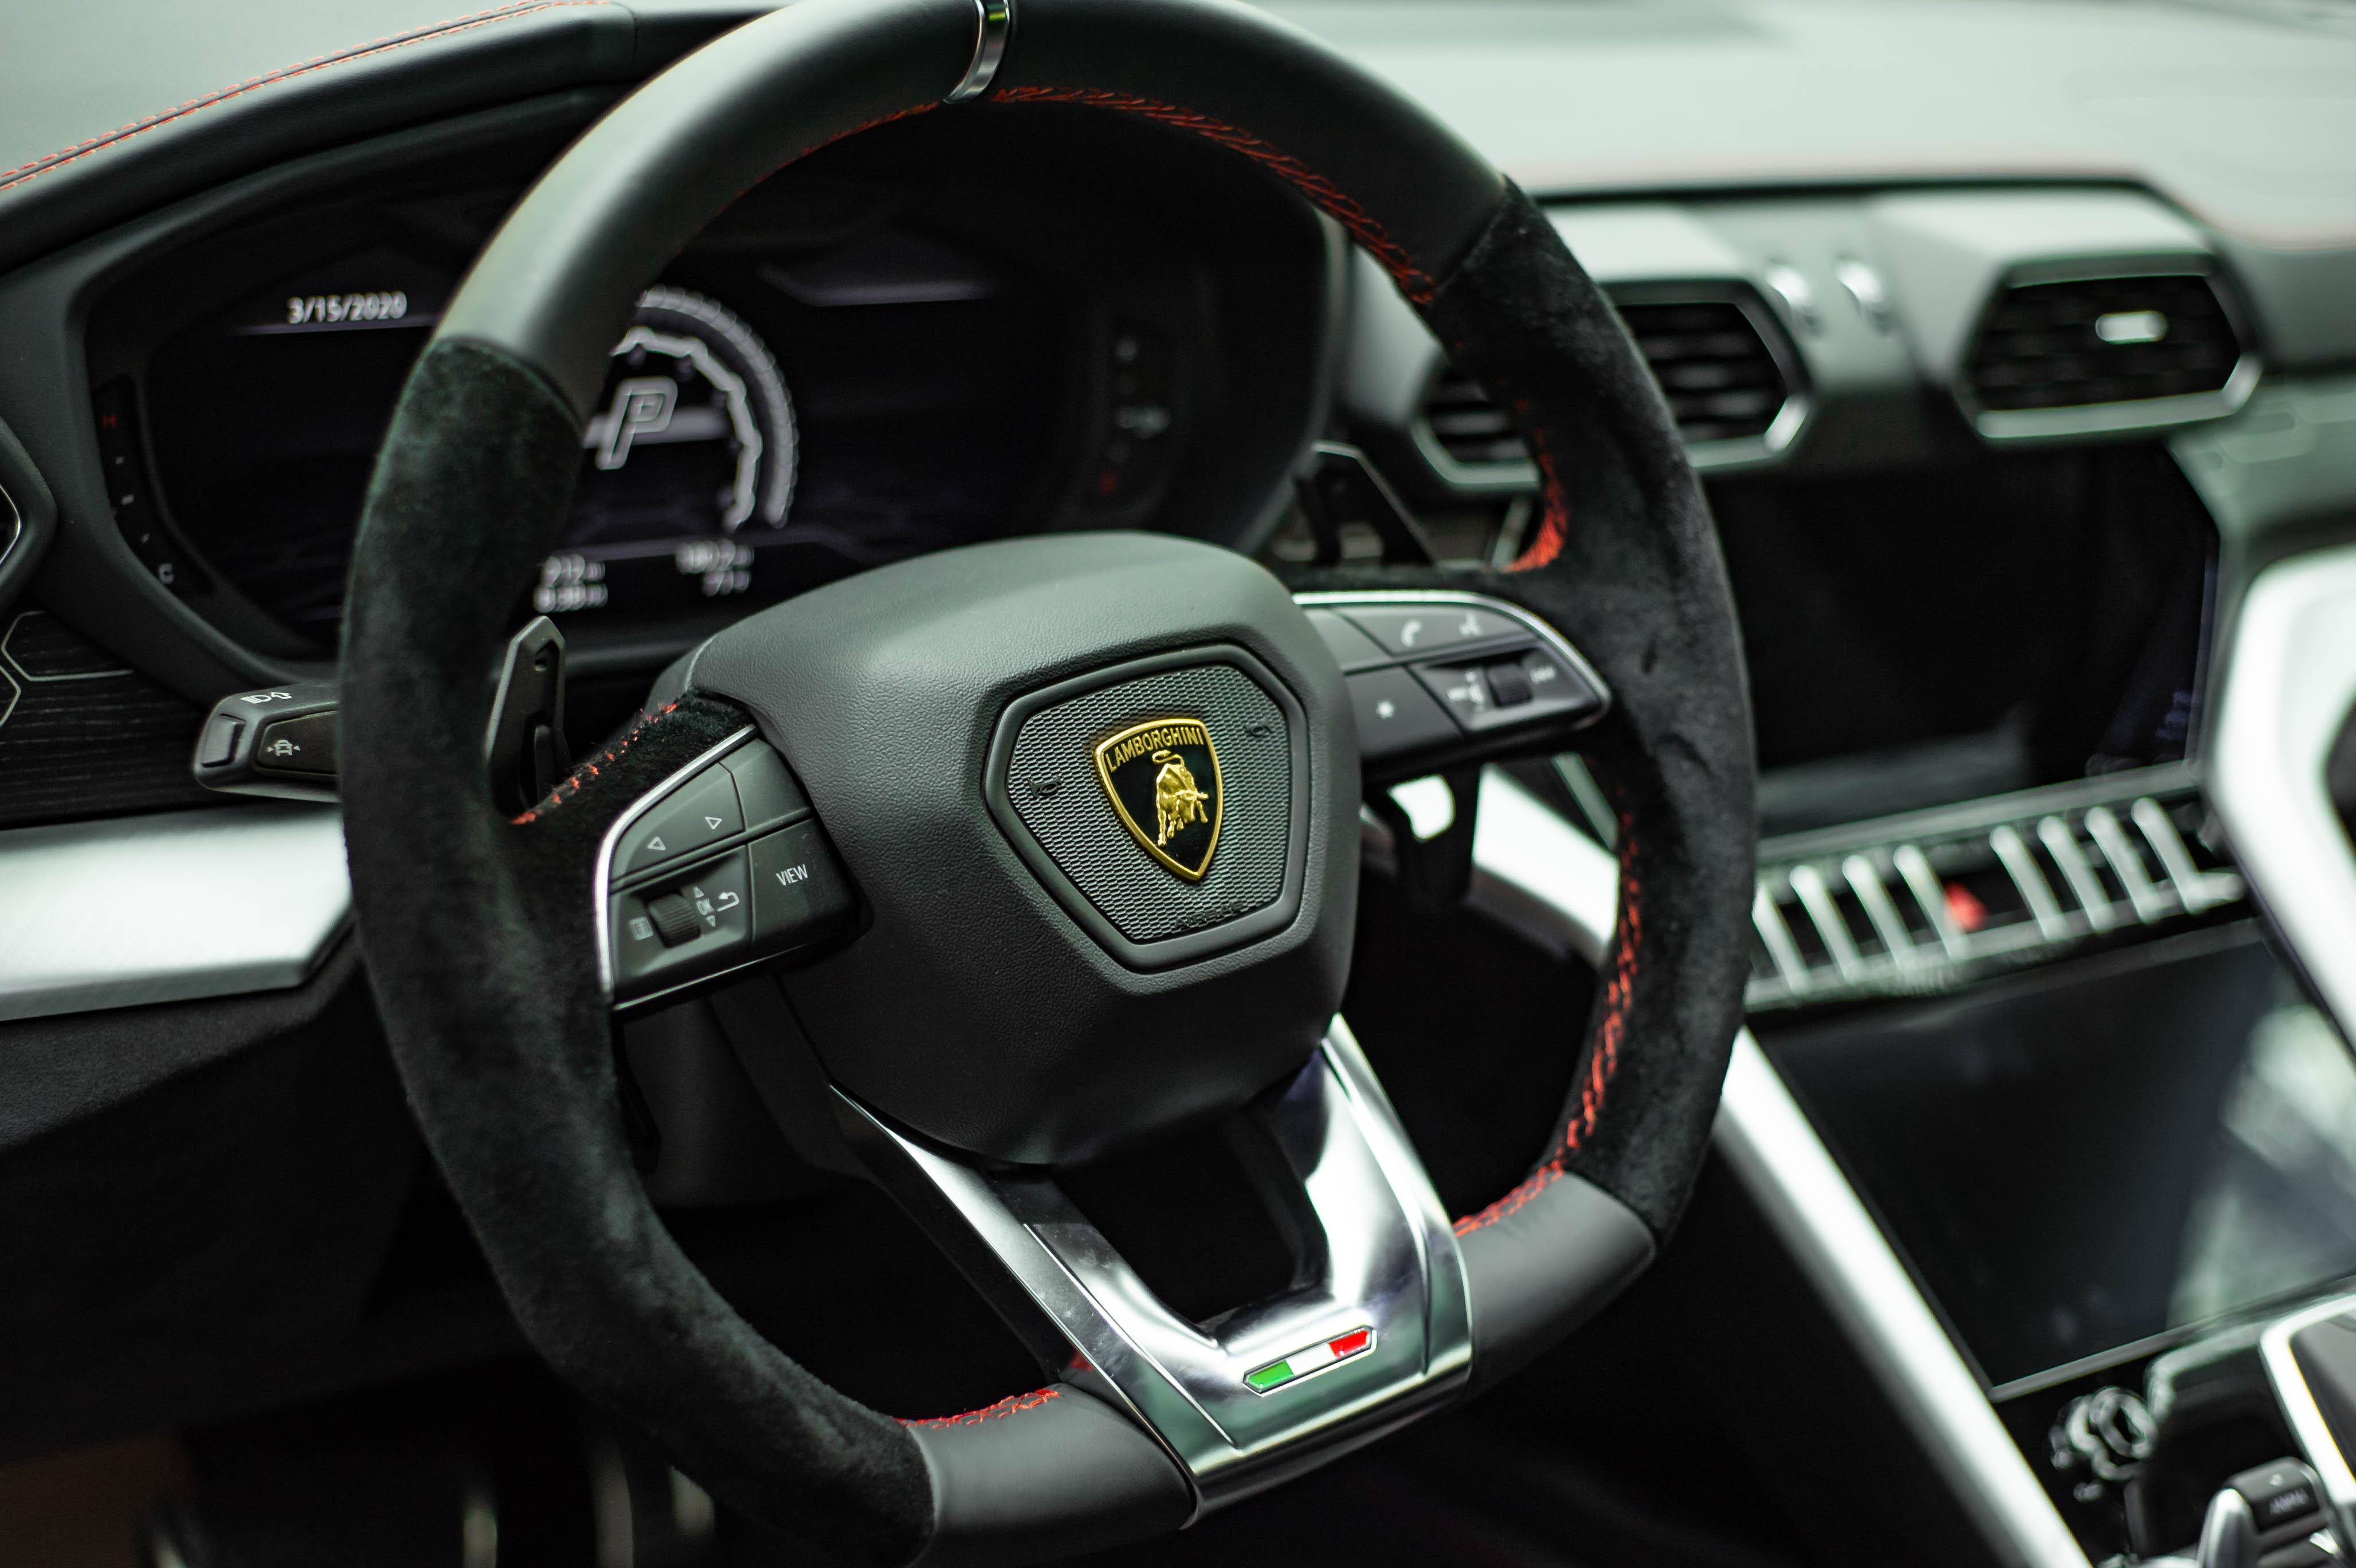 Ngam Lamborghini Urus mau den dau tien ve VN, gia khoang 1 trieu USD hinh anh 36 Urus_zing_30_.jpg